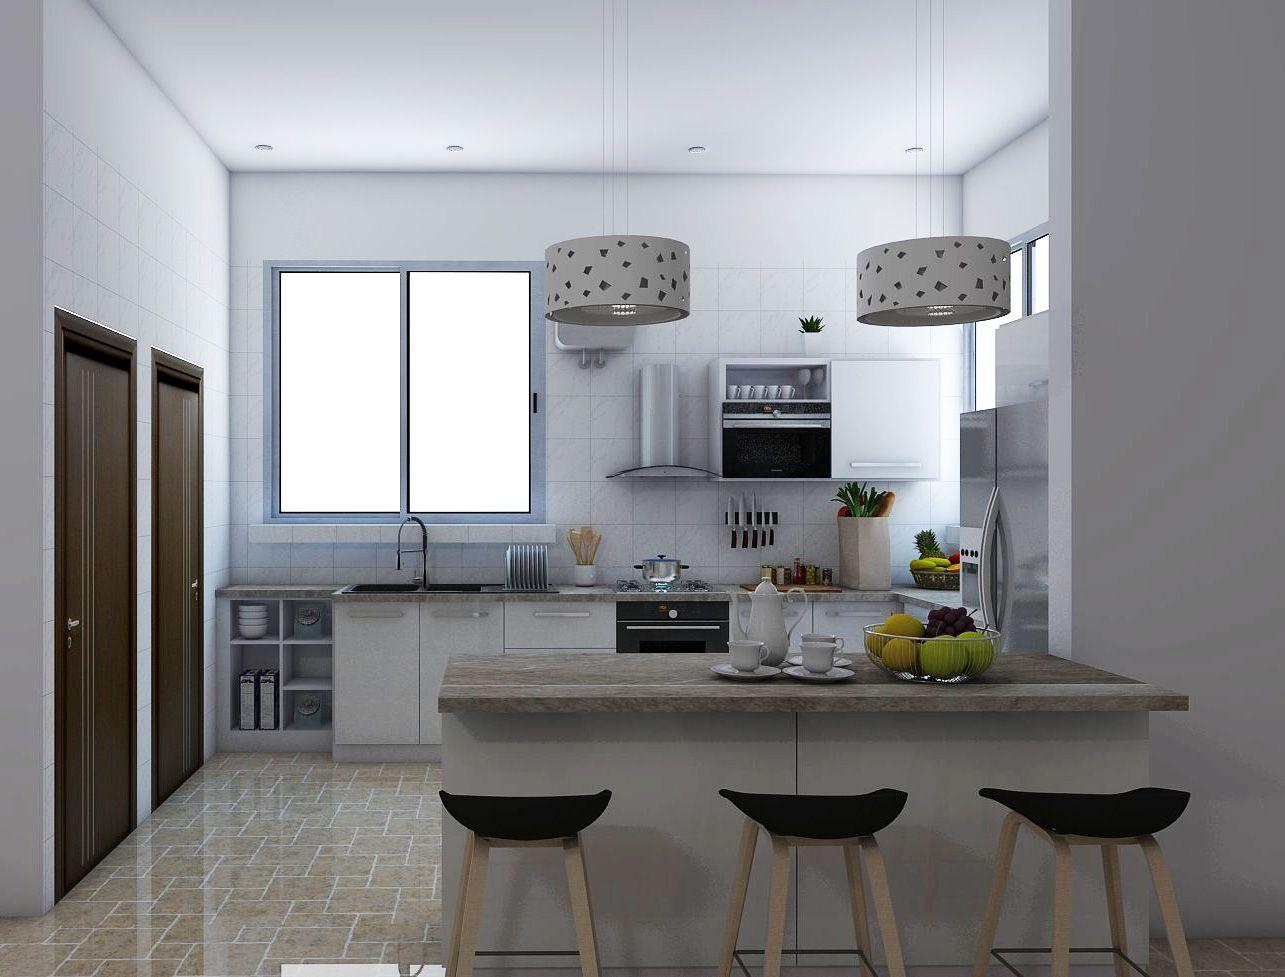 loncha kitchen architectural designs #3drendering #